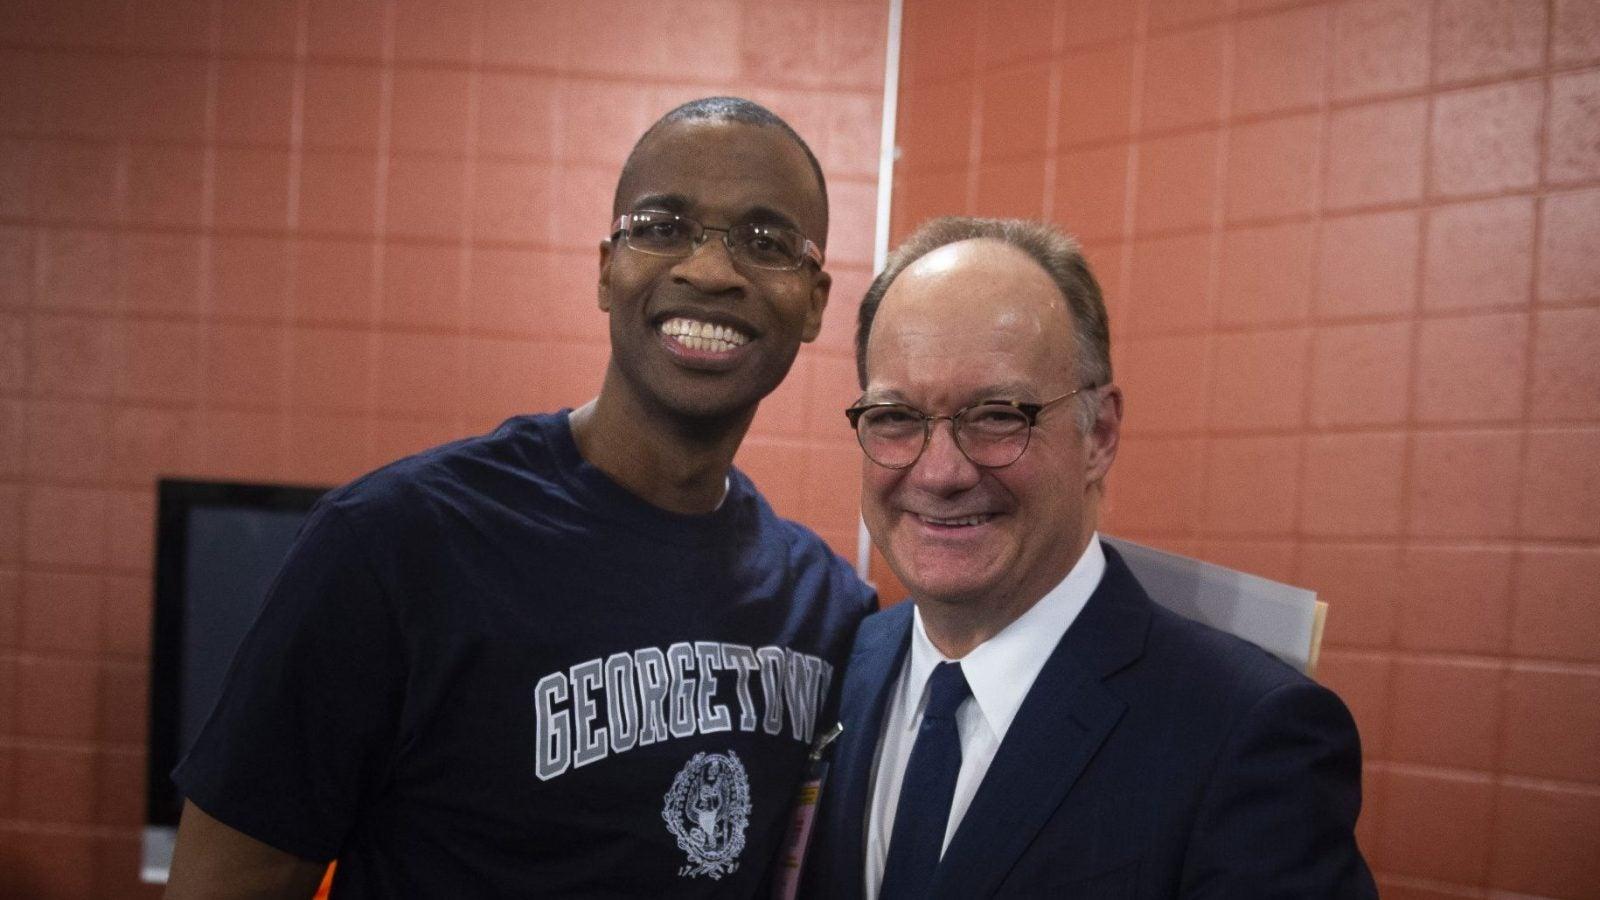 Joel Caston wears a Georgetown shirt and poses with Georgetown President John J. DeGioia